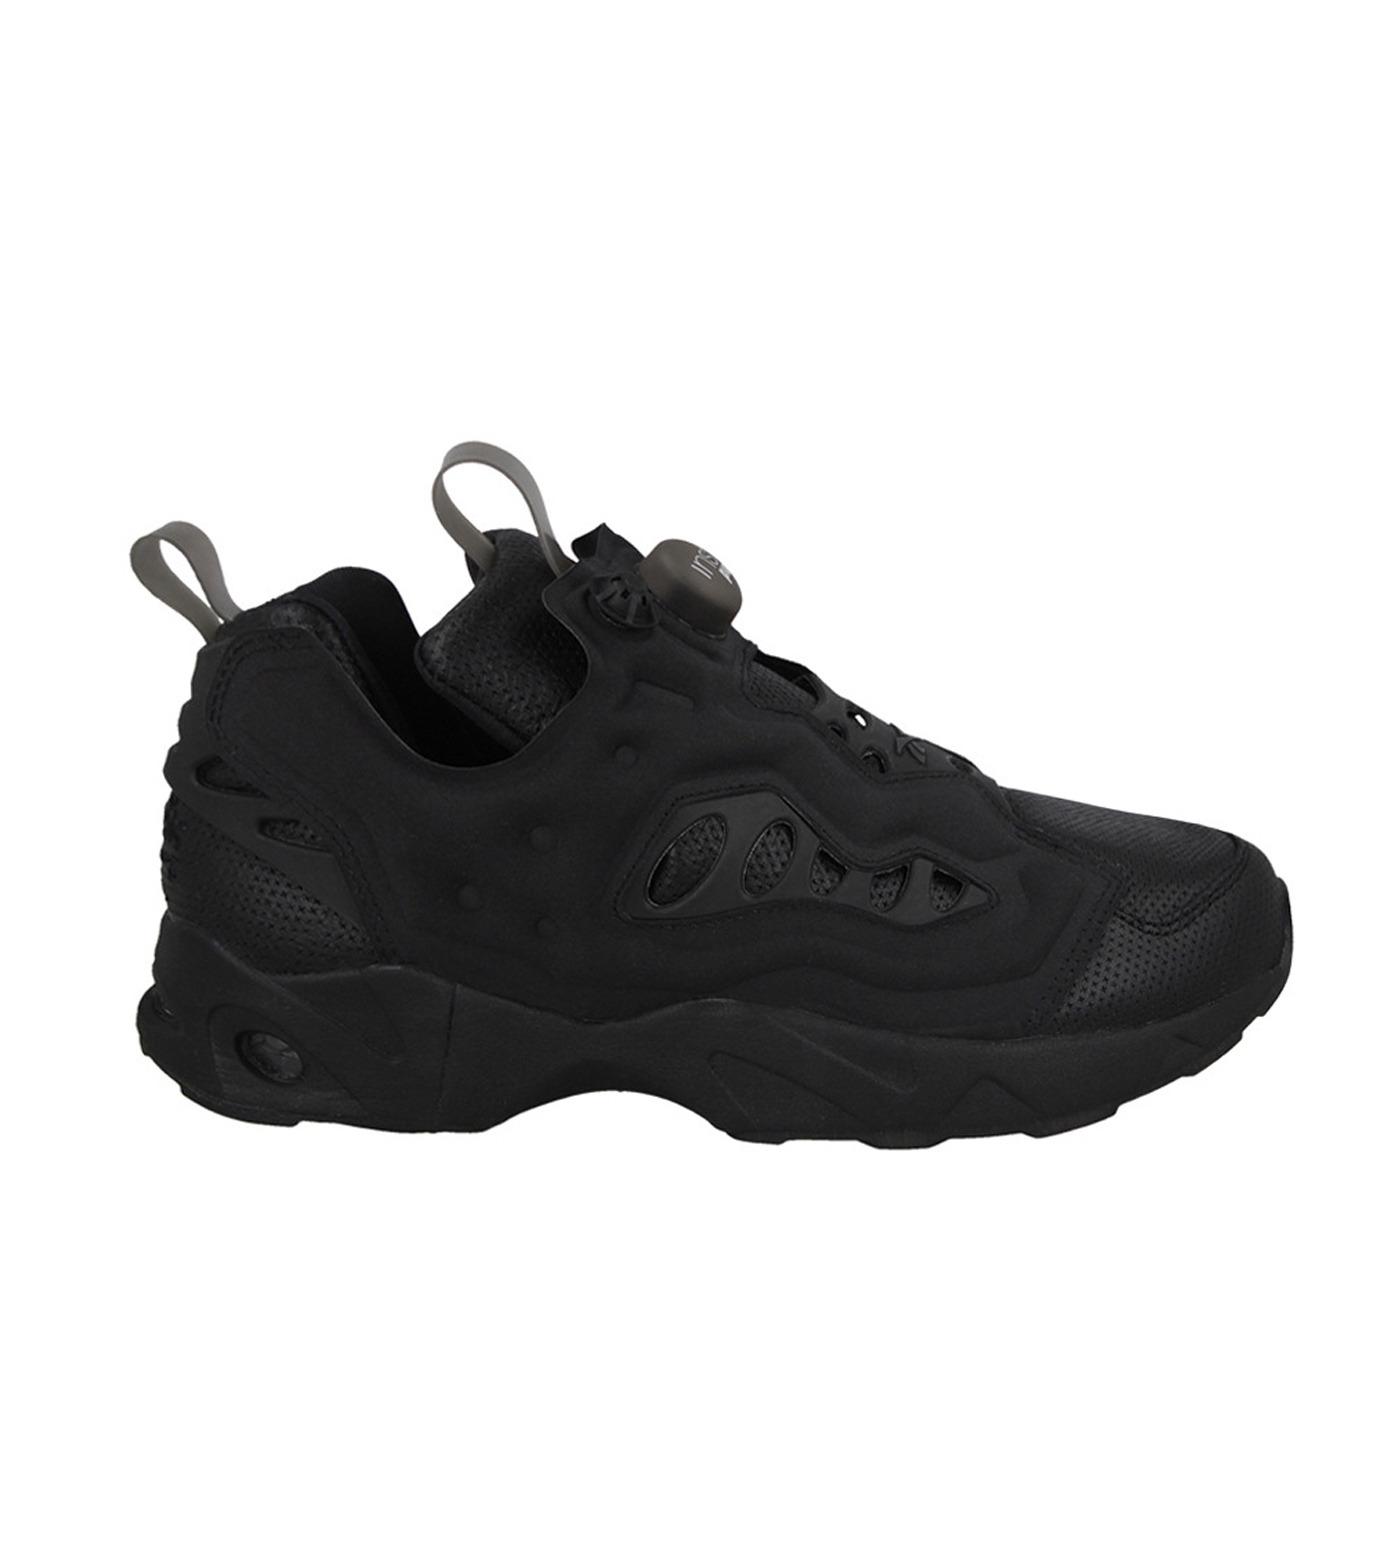 Reebok(リーボック)のINSTAPUMP FURY ROAD PL-BLACK(シューズ/shoes)-AQ9978-13 拡大詳細画像1